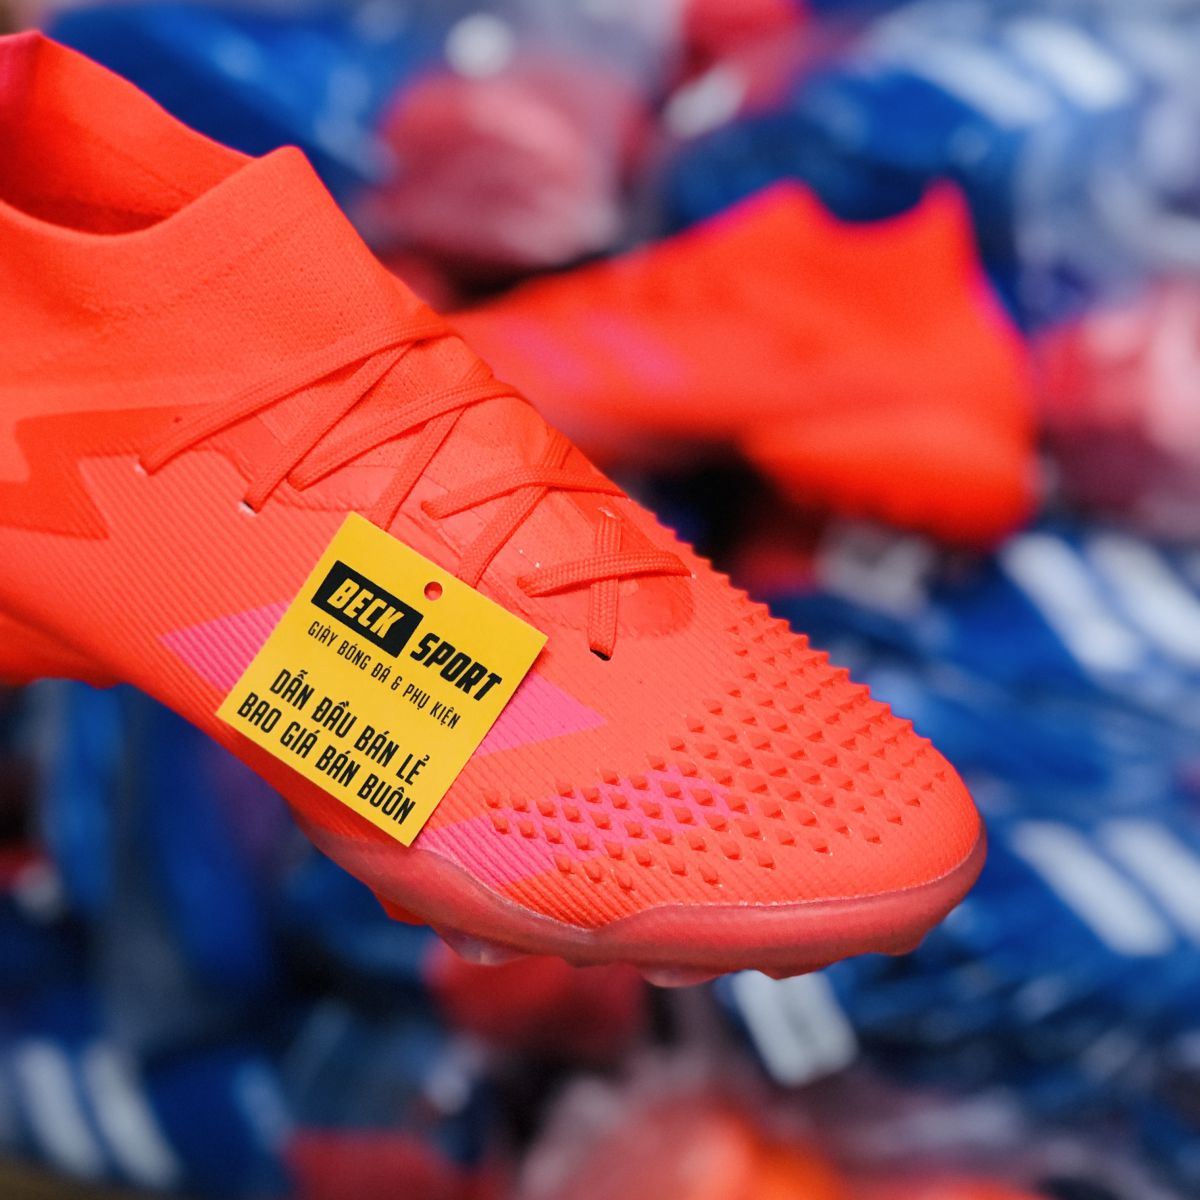 Giày Bóng Đá Adidas Predator 20.1 Locality Đỏ Cam Cổ Cao TF